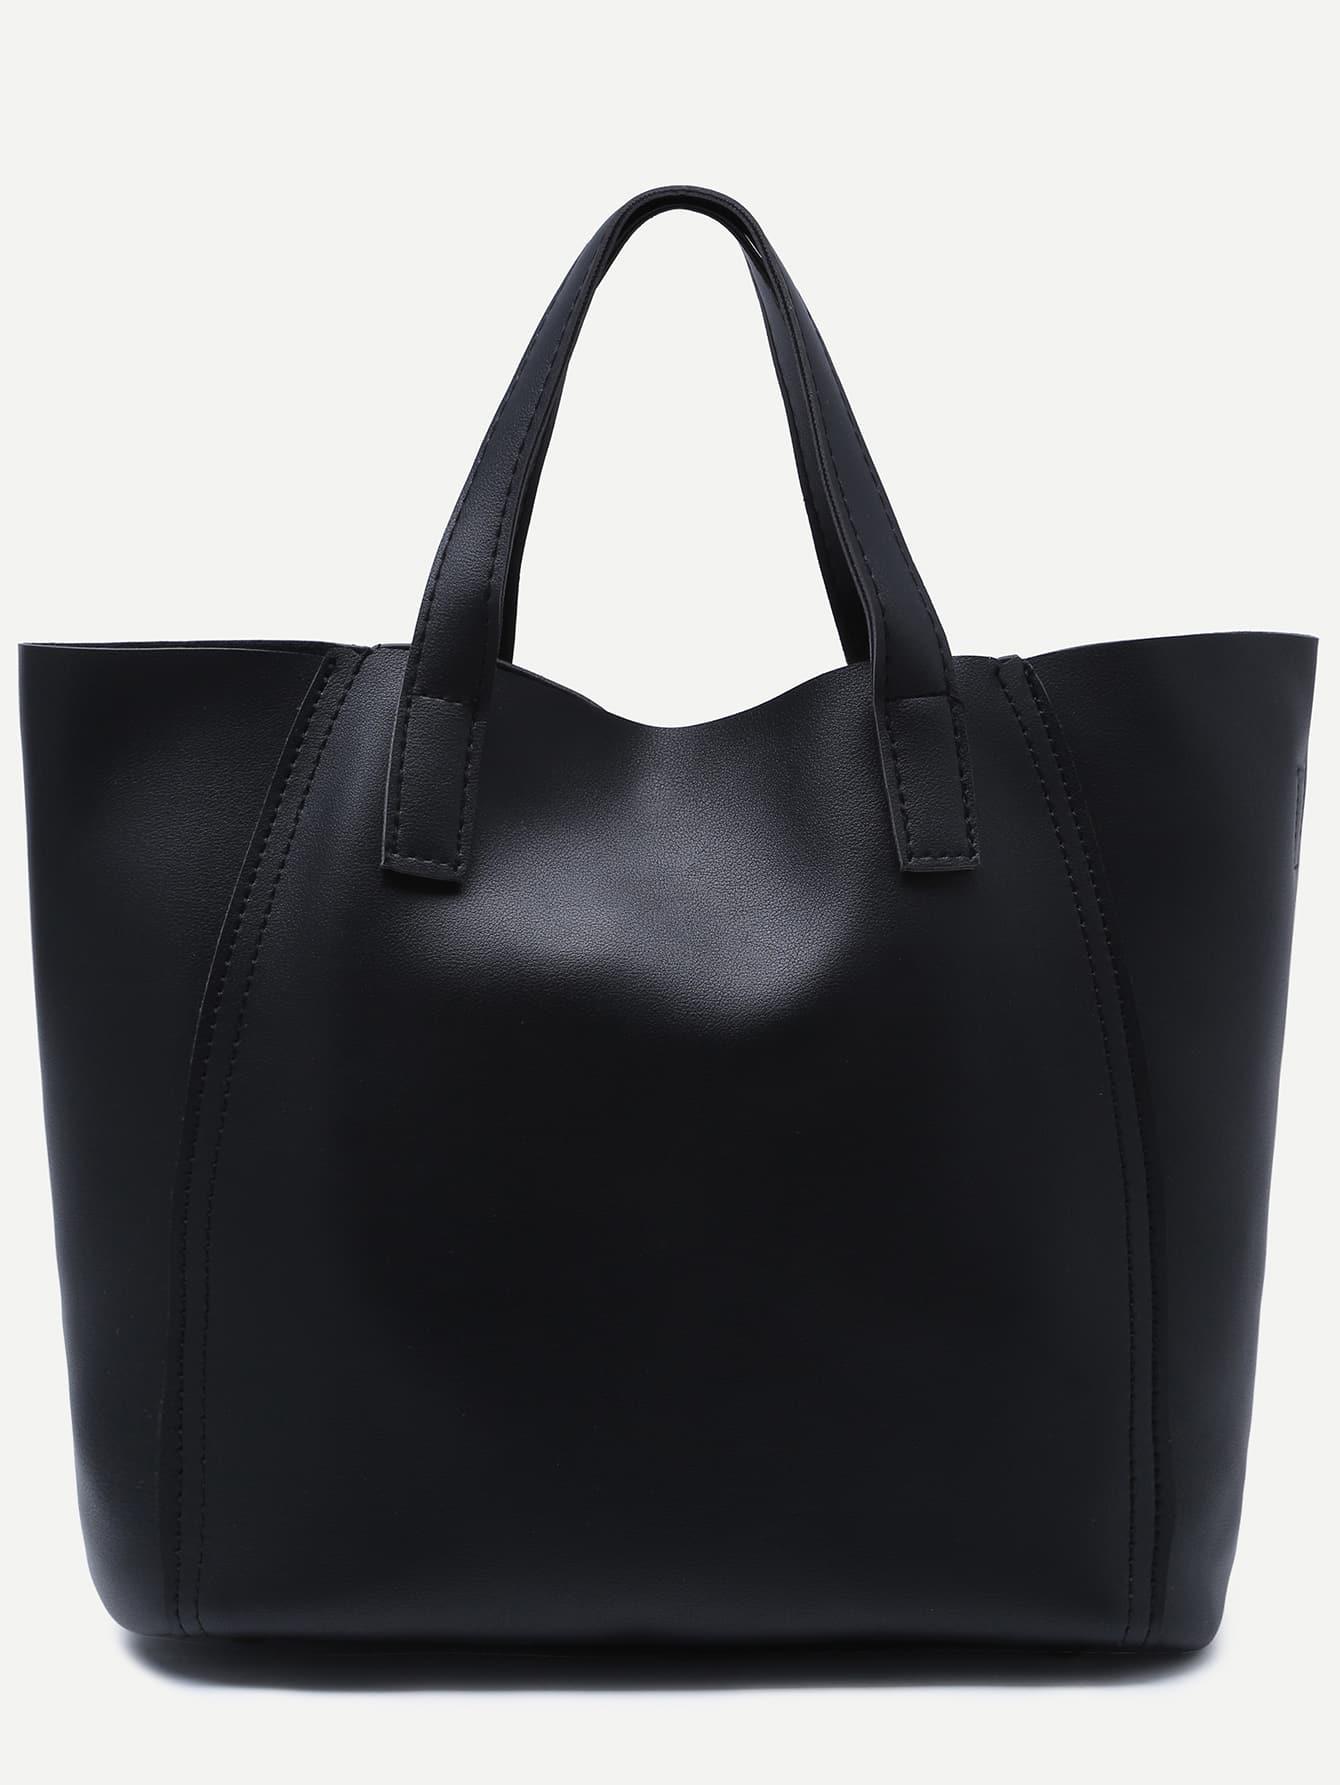 bag160825916_1